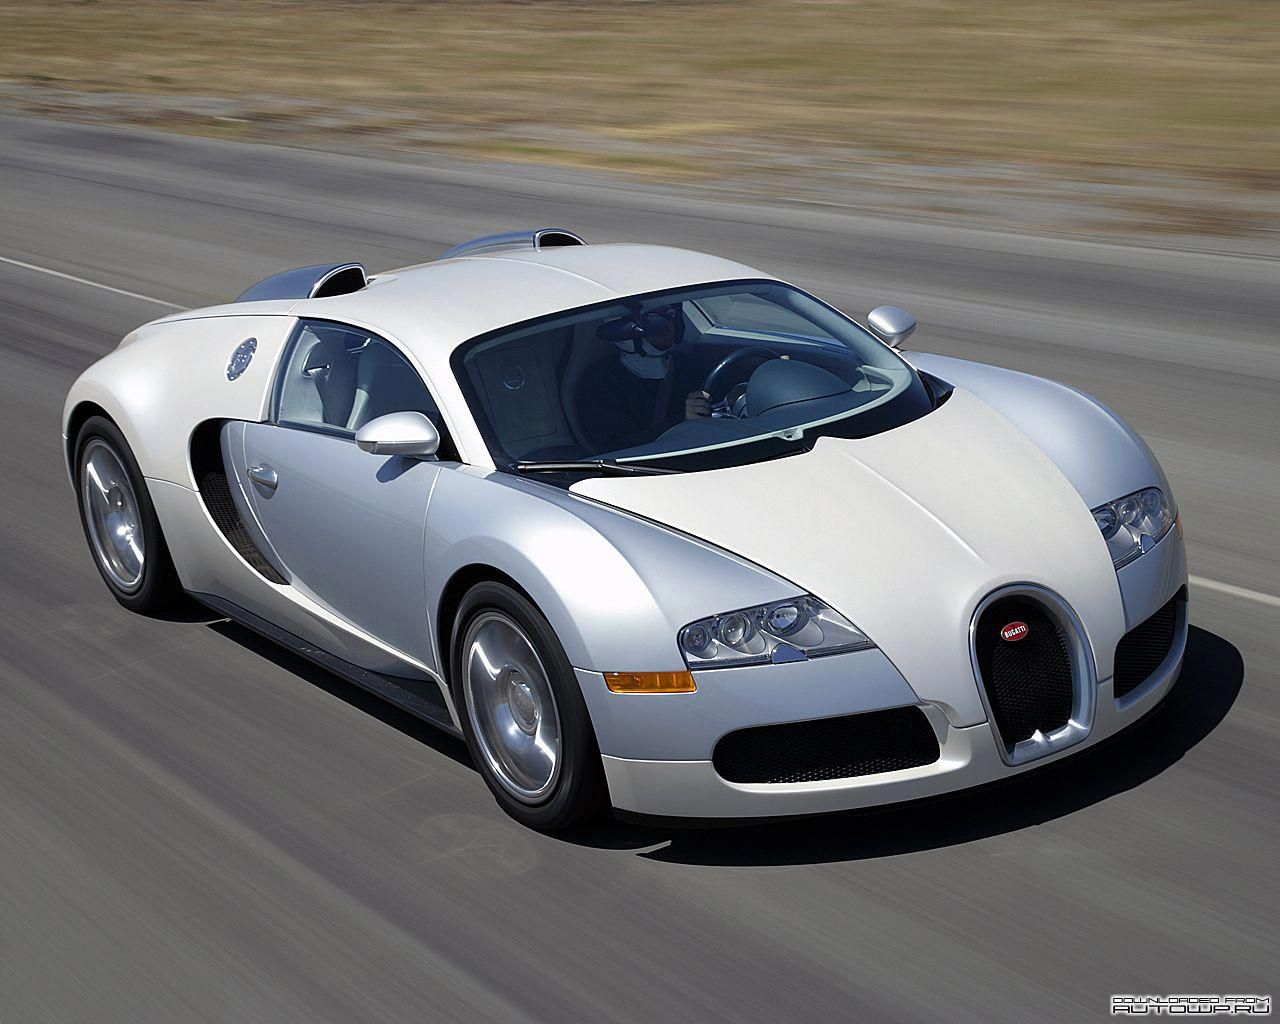 Bugatti Veyron Won T I Look Adorable Driving This Bugattichironwallpapers Bugatti Veyron Bugatti Veyron